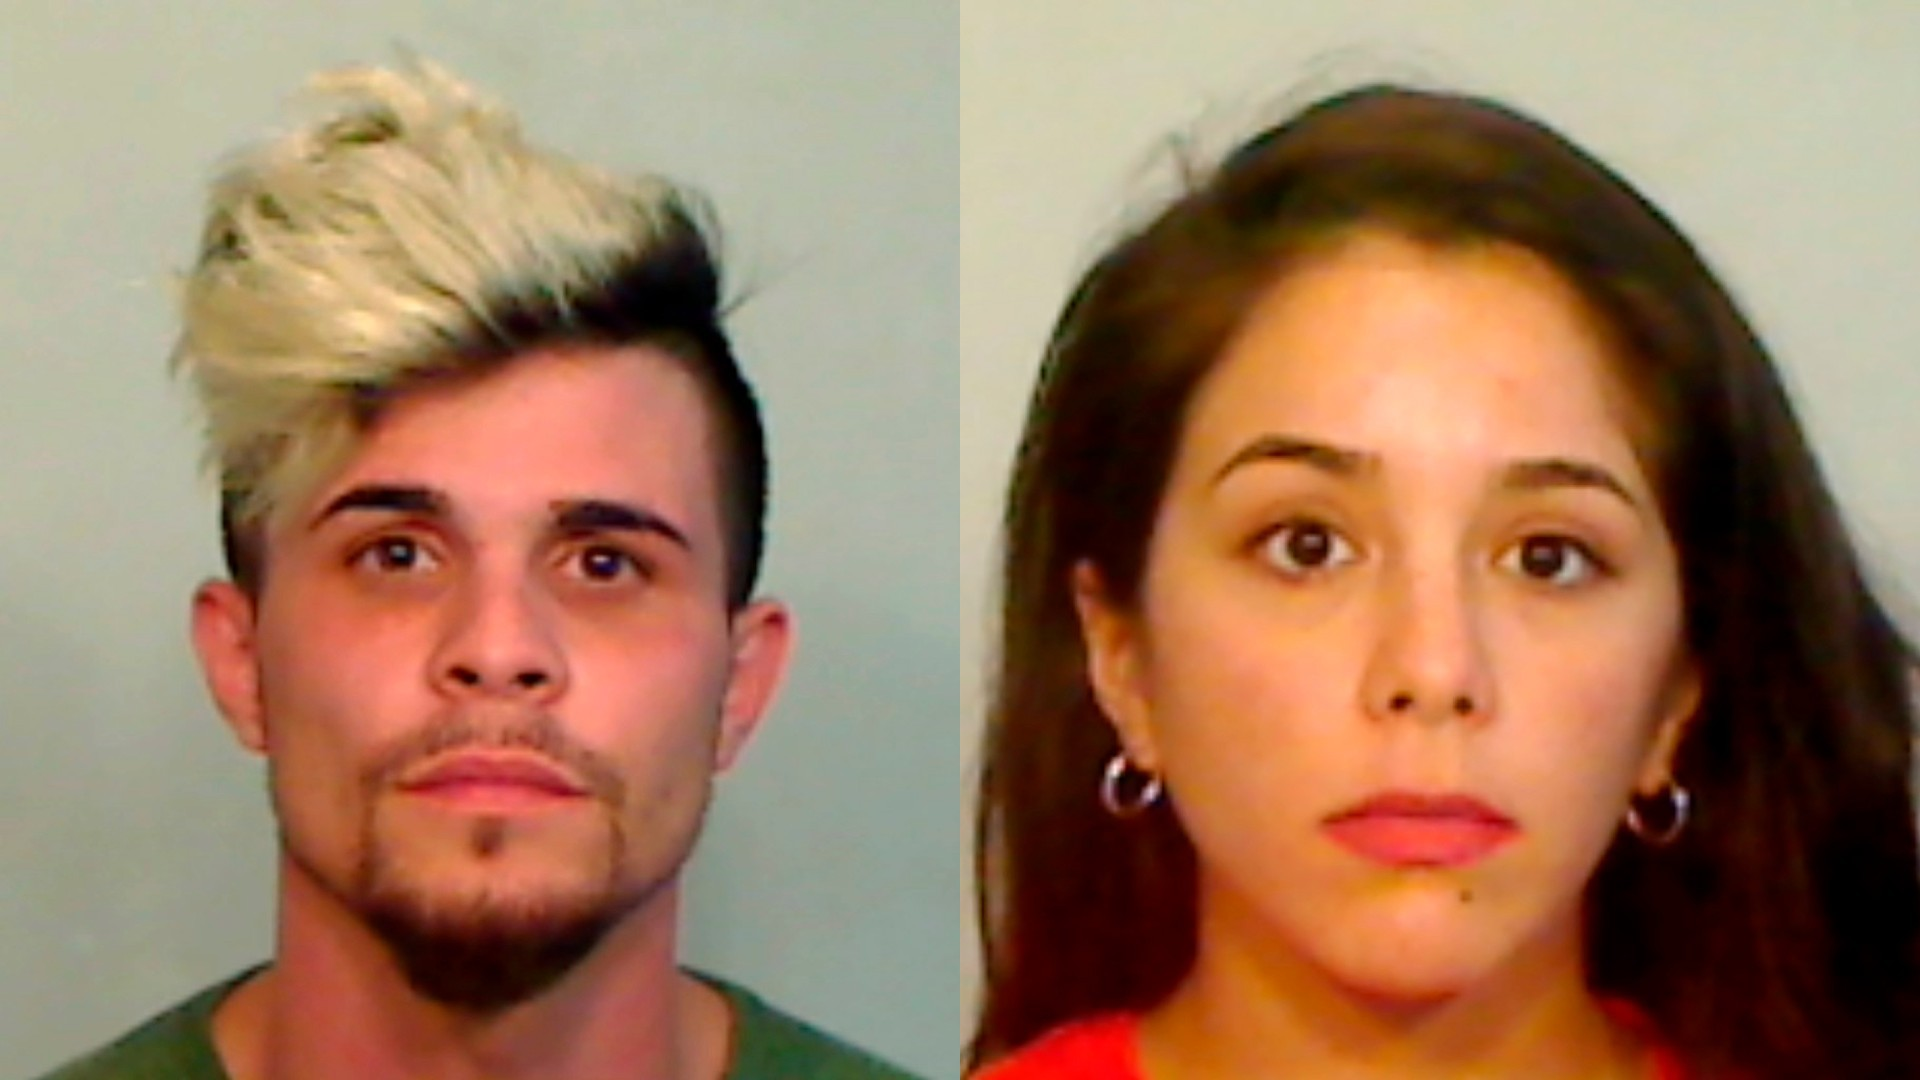 Jose Antonio Freire Interian, right, and Yohana Anahi Gonzalez, left, are seen in booking photos. (Monroe County Sheriff's Office via AP)